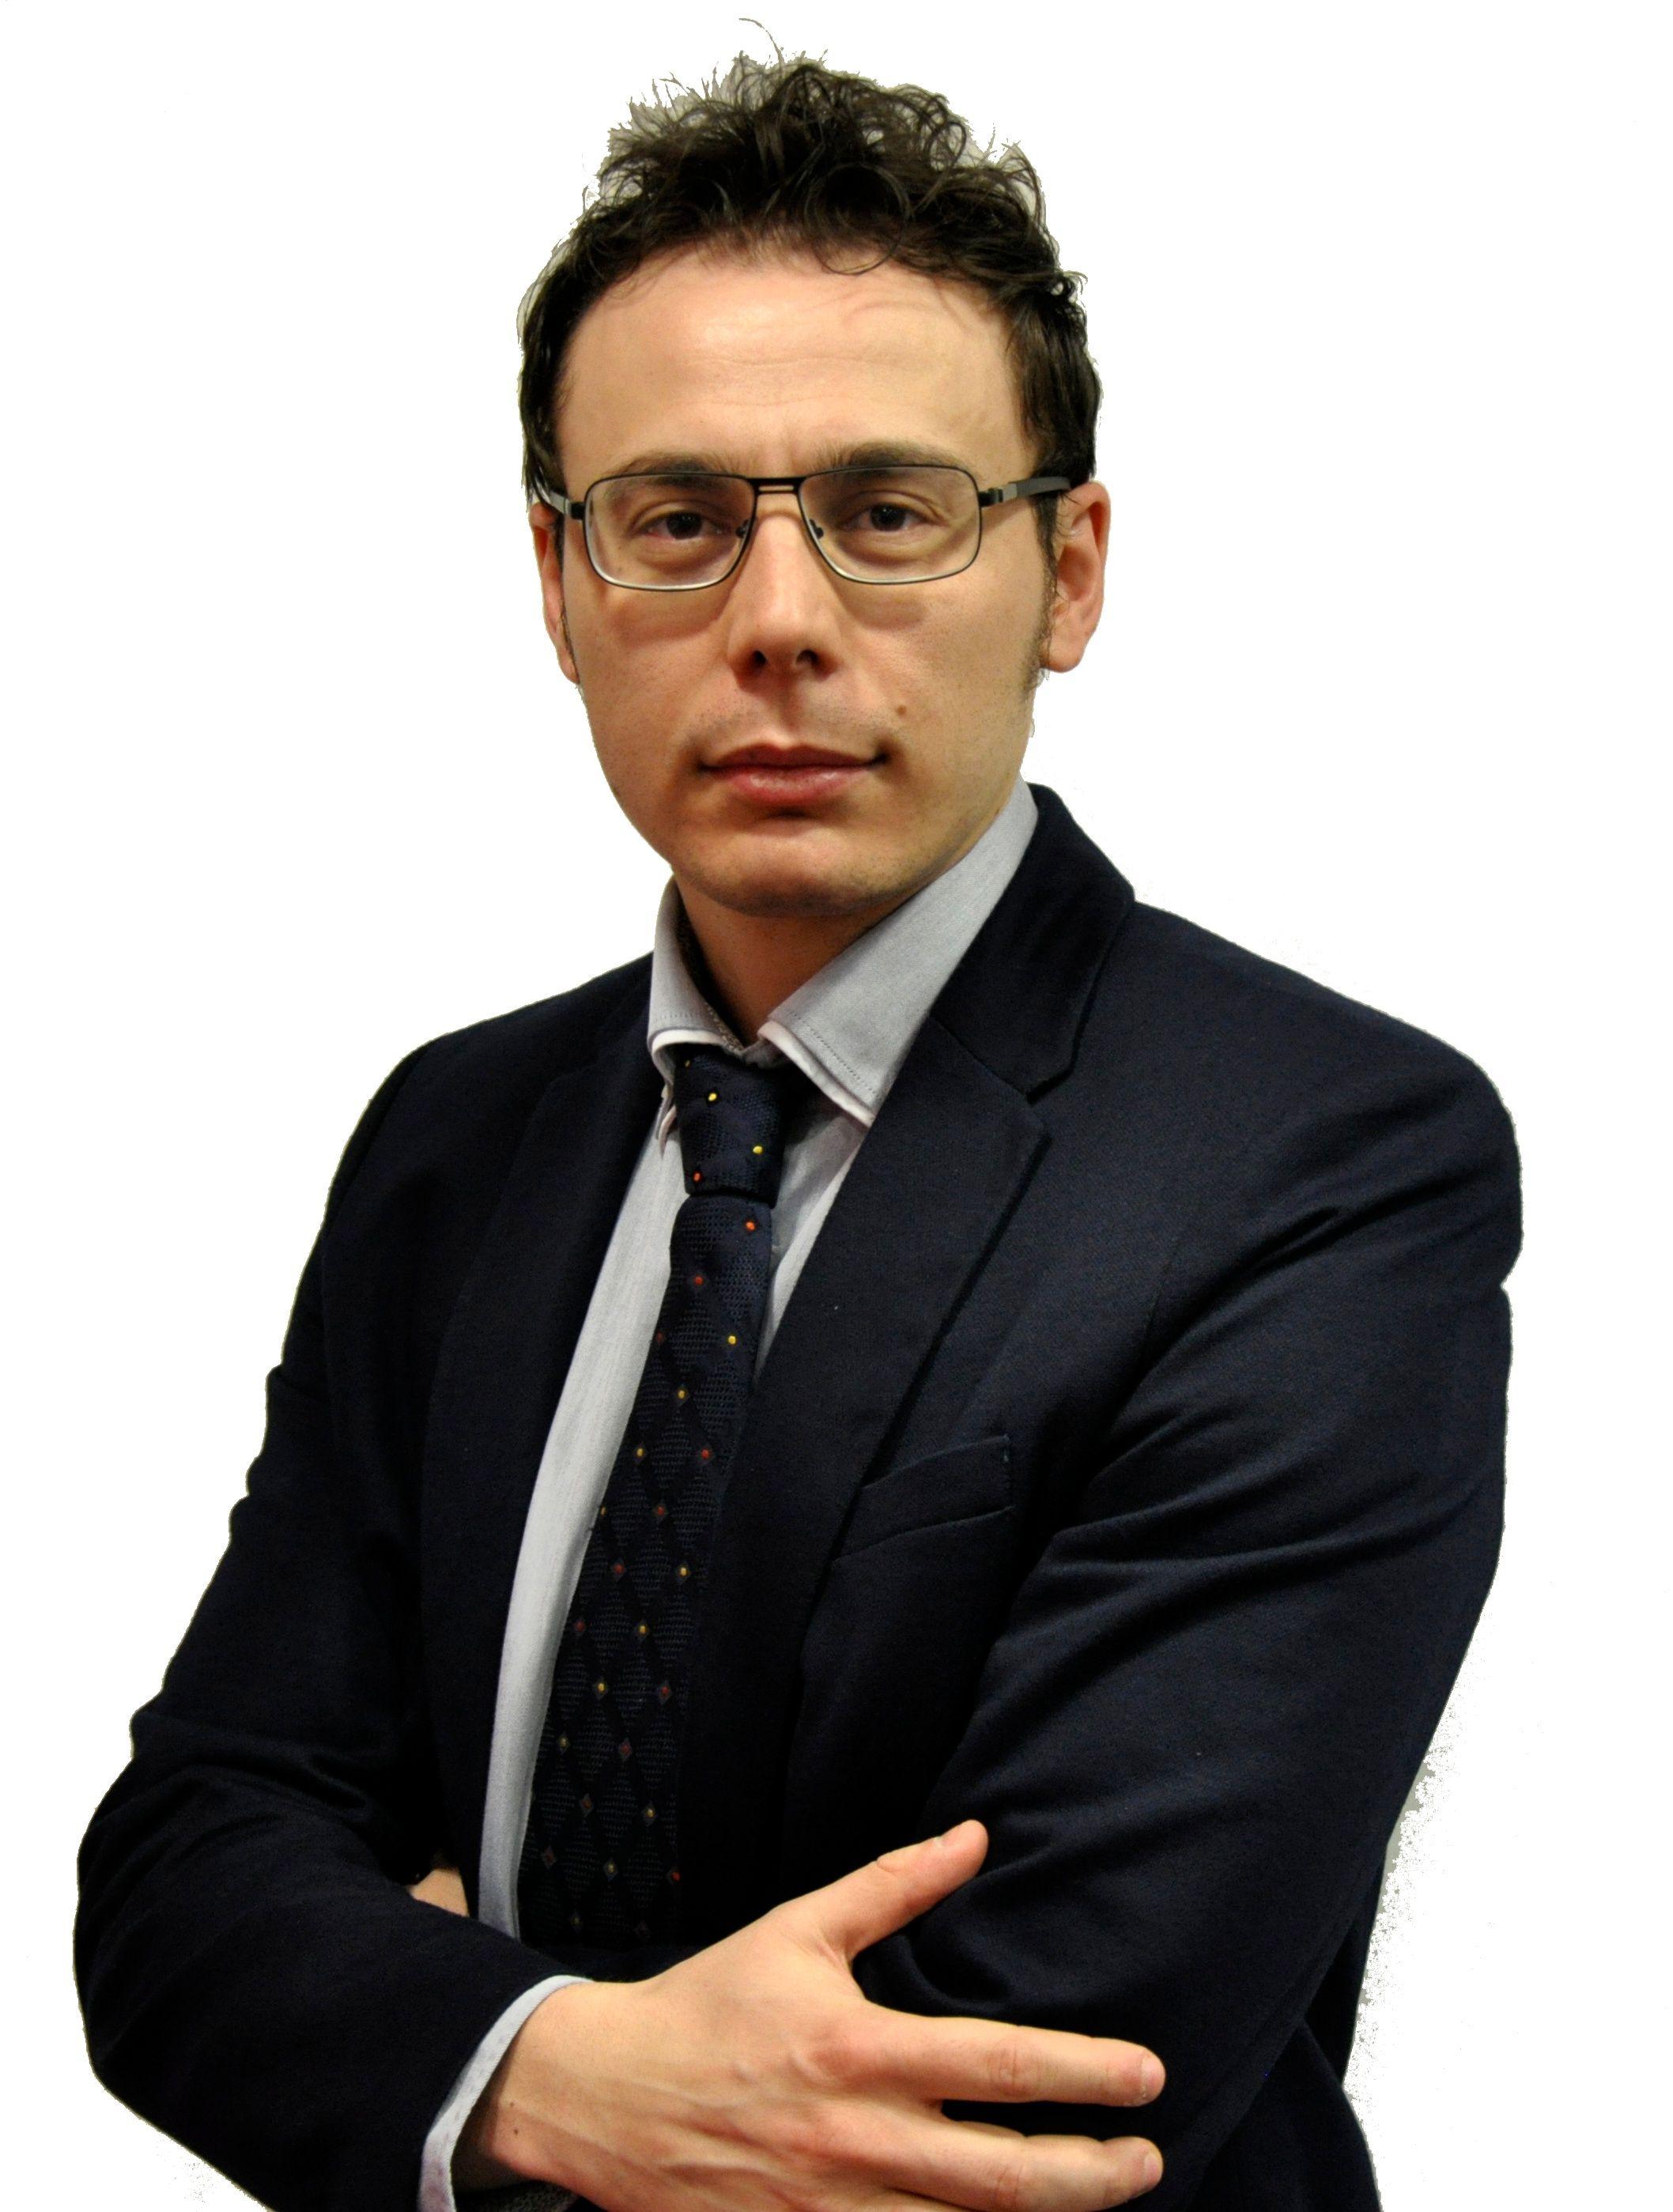 Andrea-di-Marco.jpg